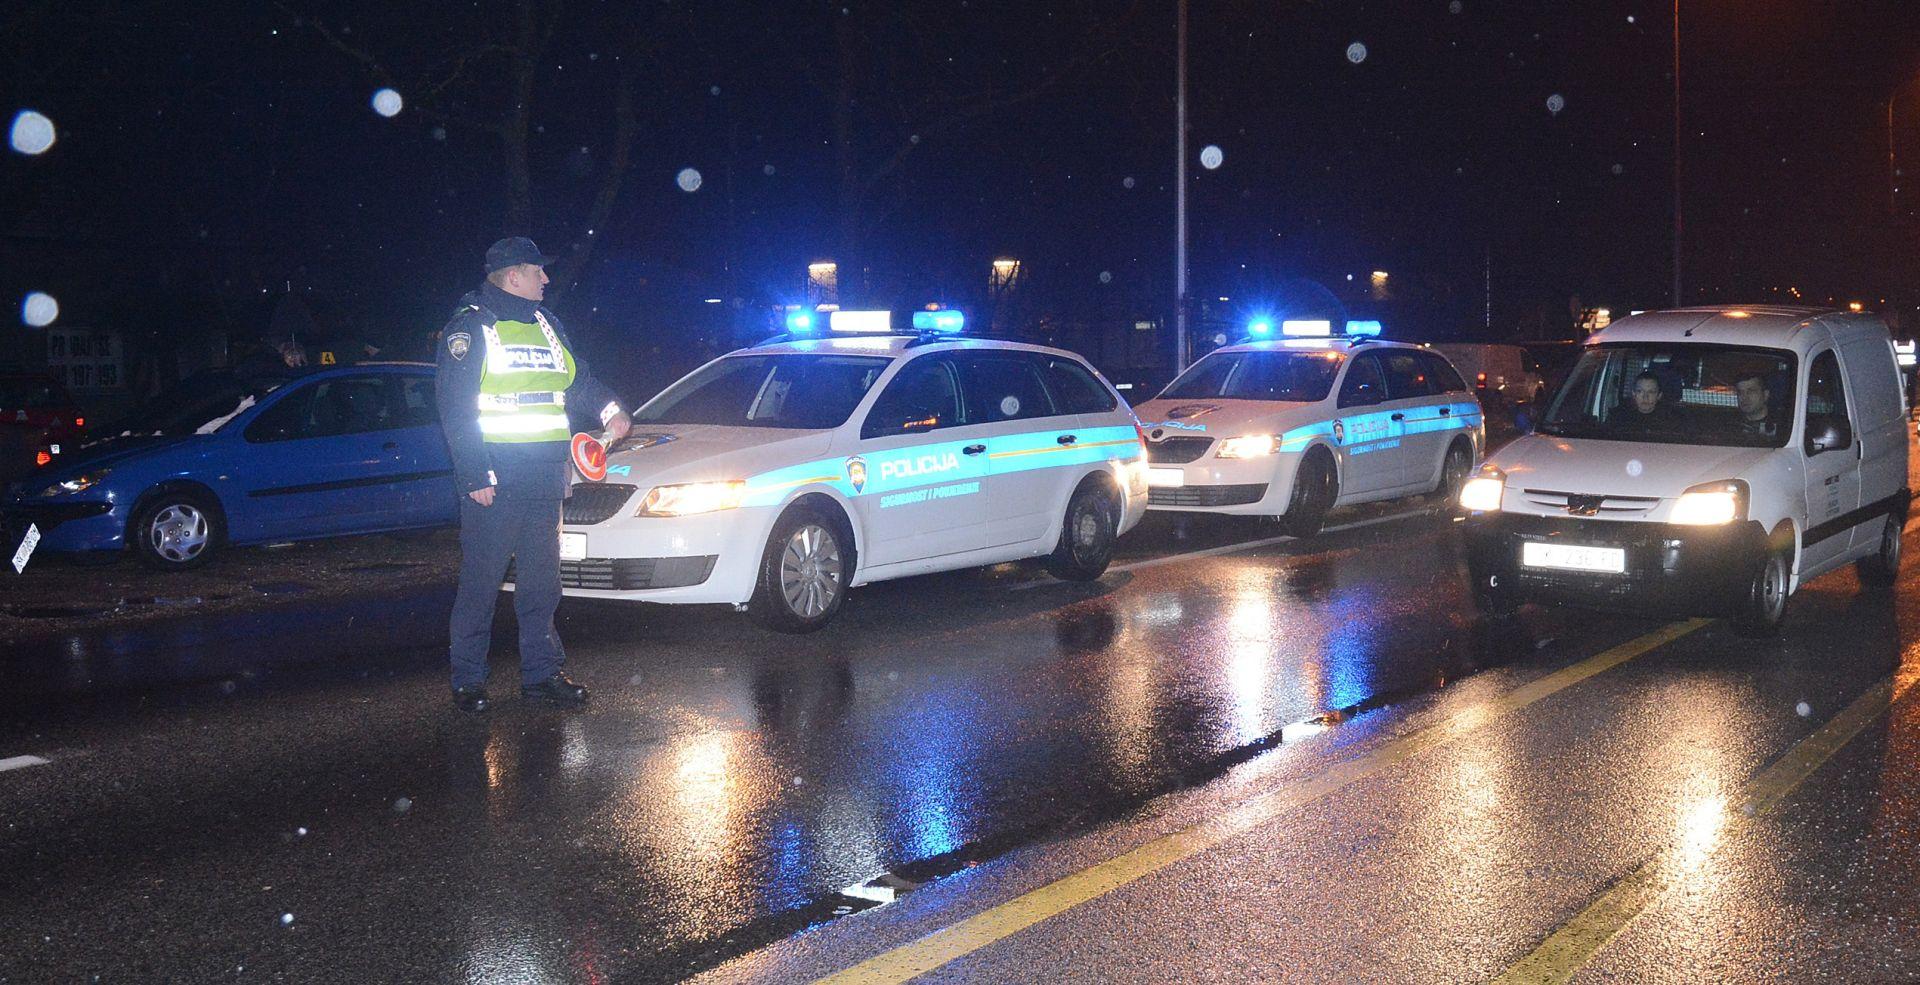 SISAK Vozač udario u betonski stup i poginuo